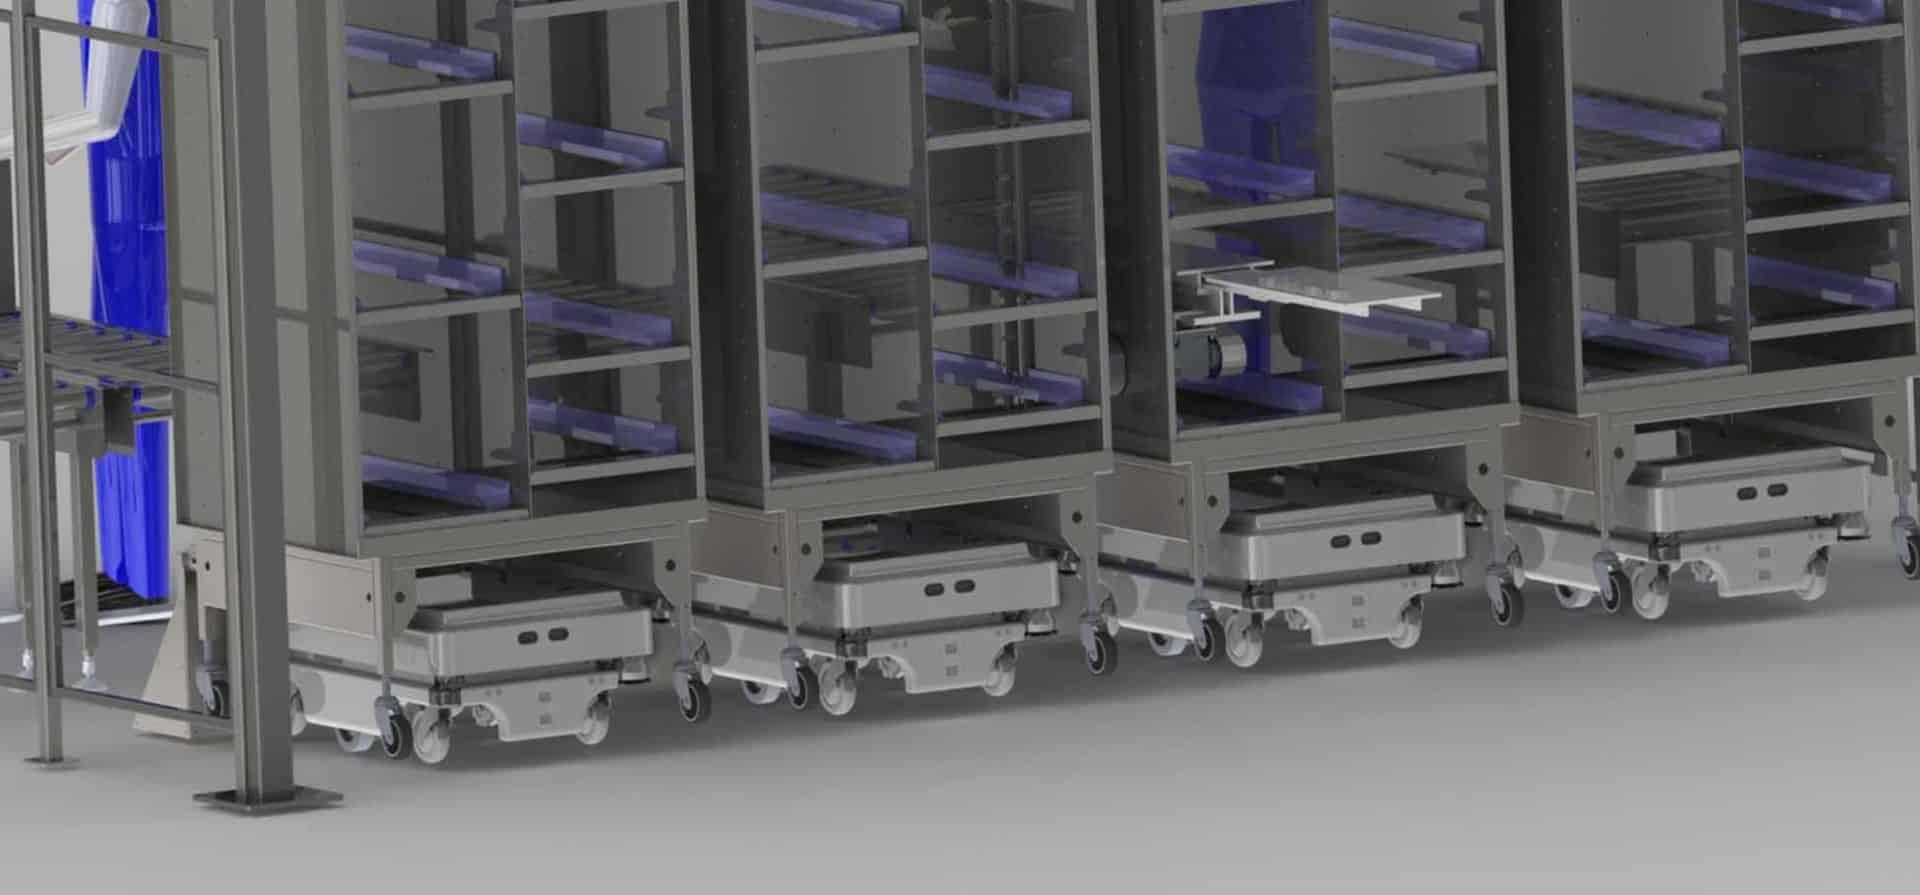 Mobile Industrial Robots | Euroflow Engineering